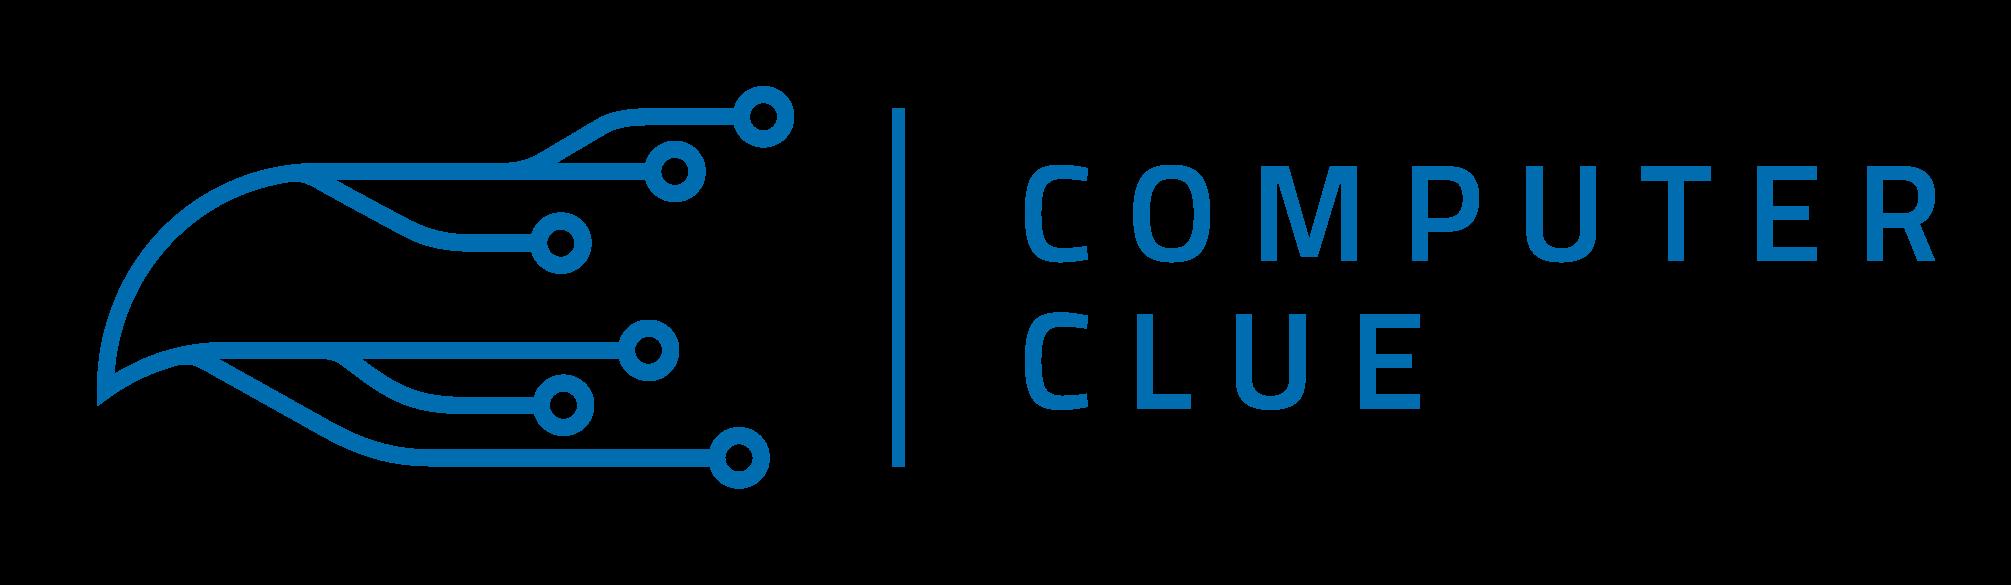 Computer Clue